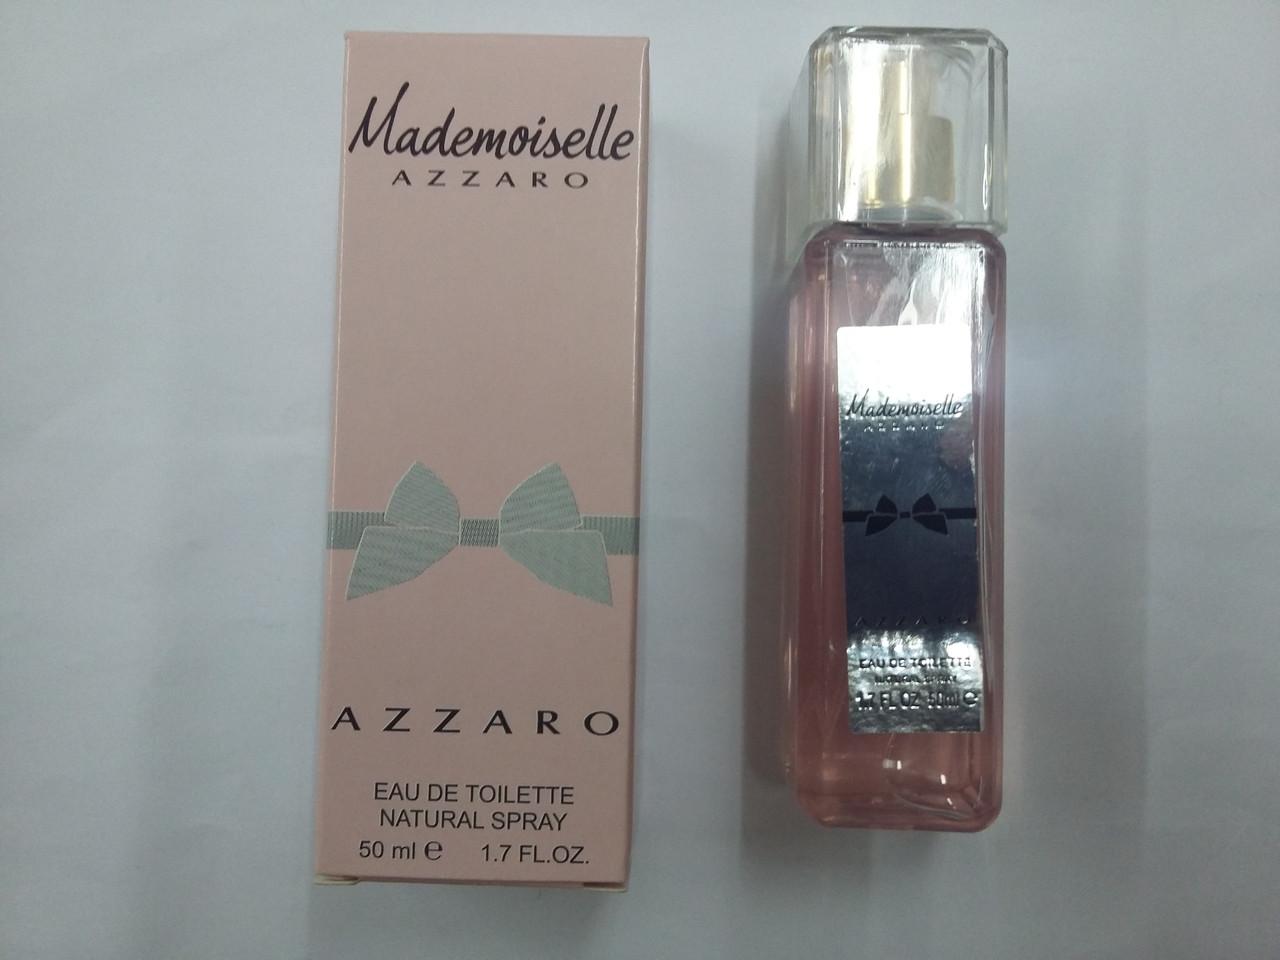 Мини-парфюм Azzaro Mademoiselle 50 мл